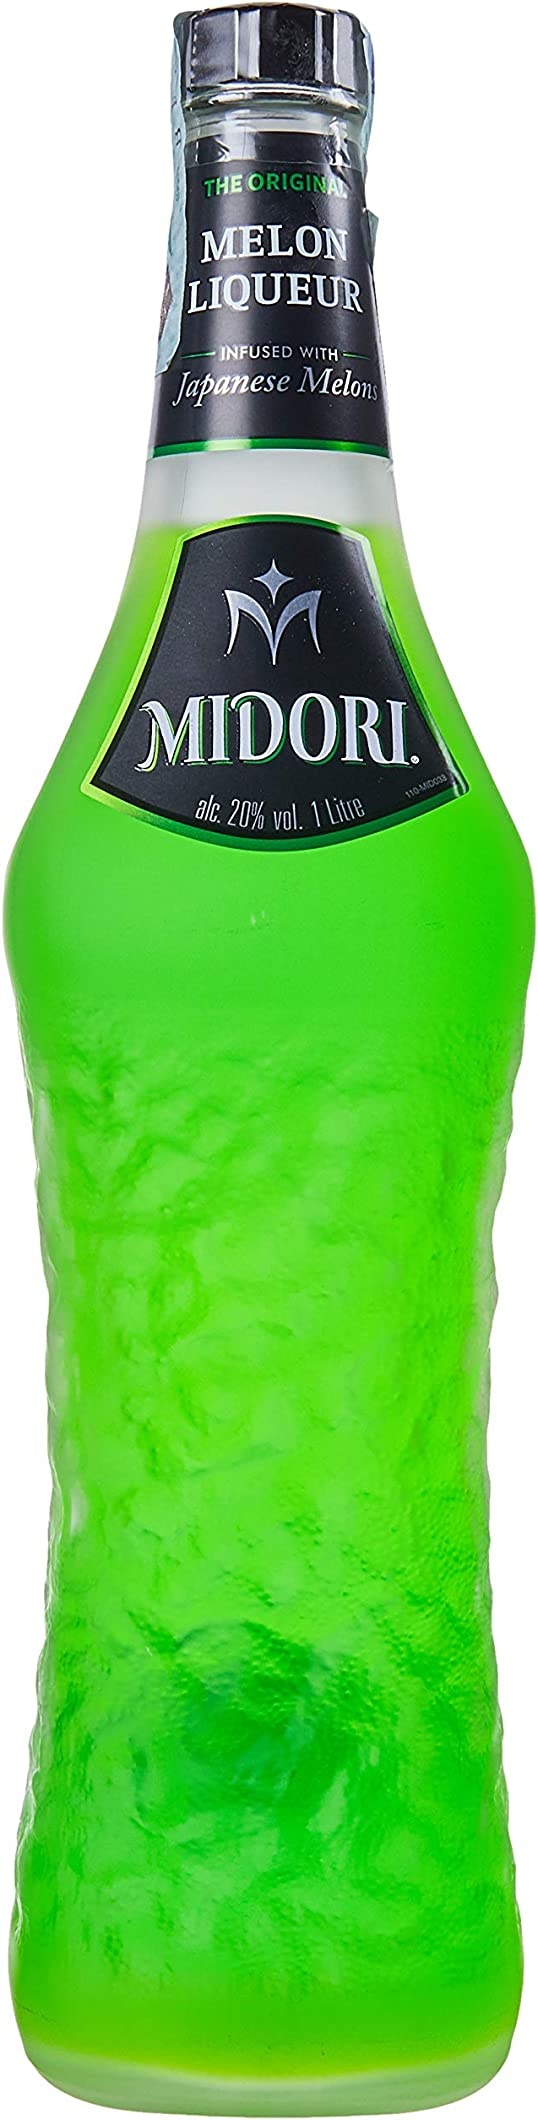 Liquore anguria - midori liquore melone, alc. 20 % vol., 1l 4015132.1